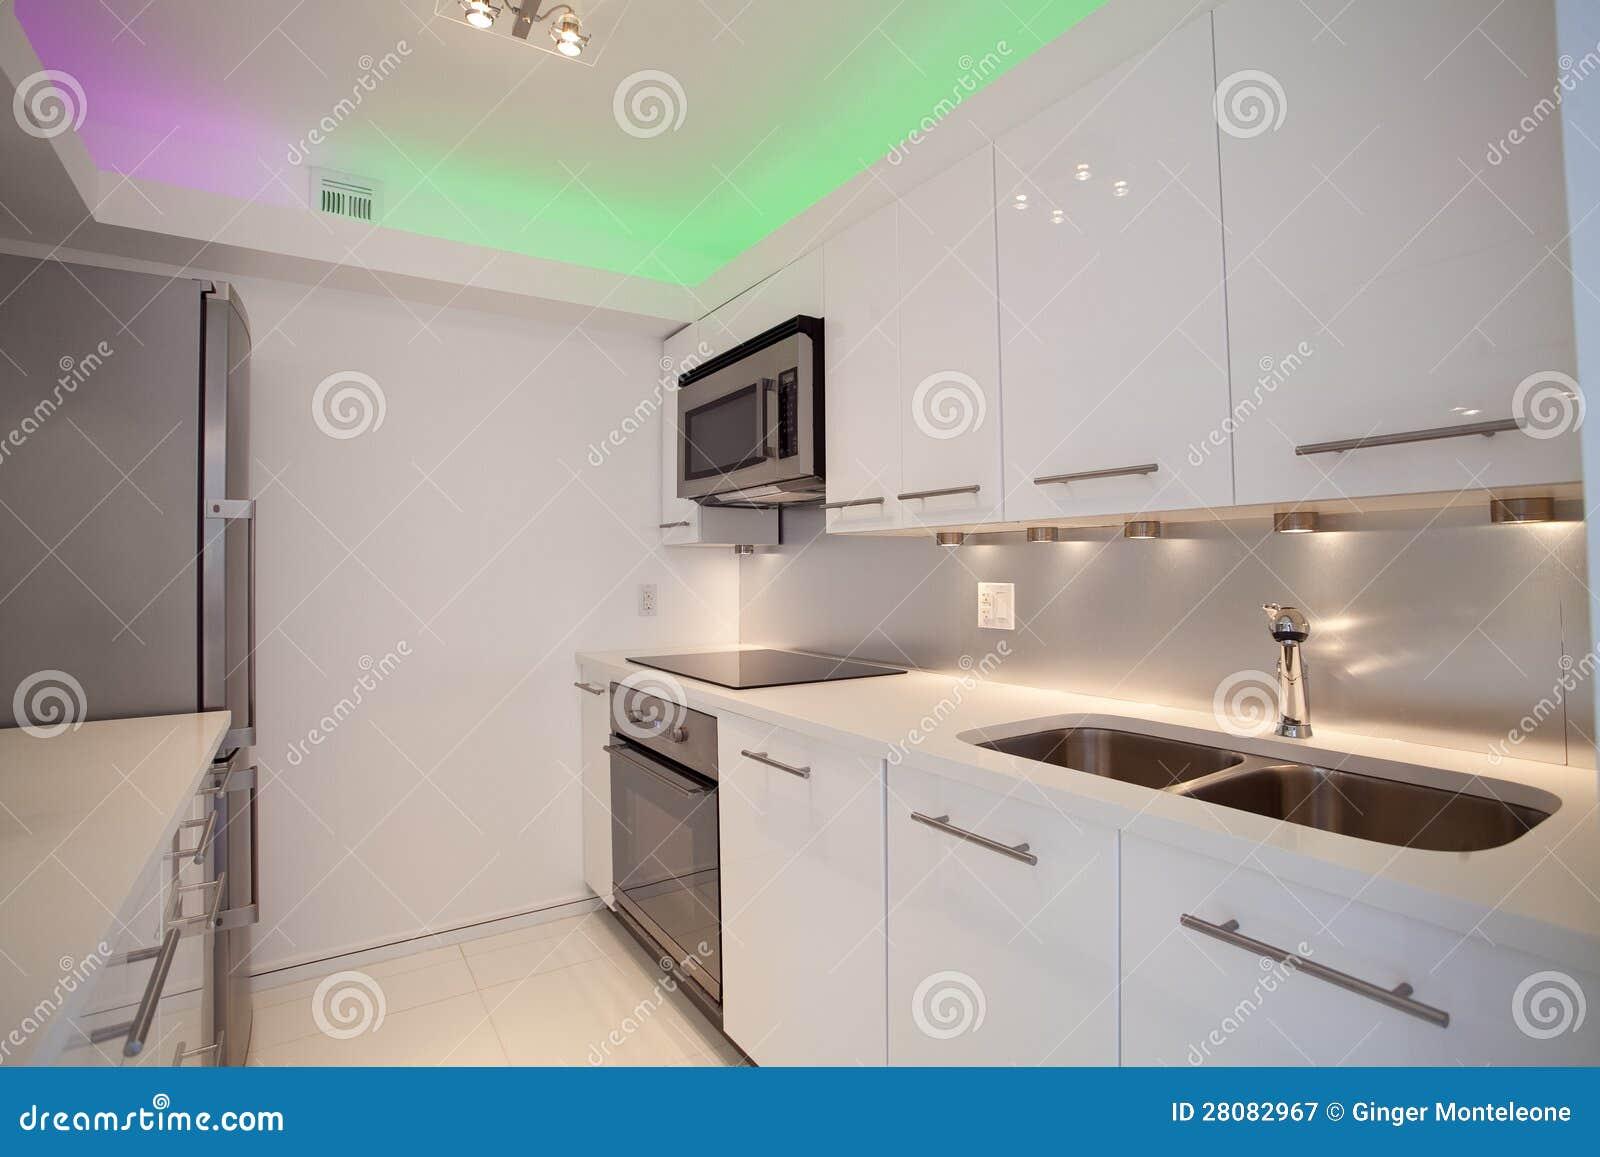 Cucina contemporanea bianca immagine stock immagine di for Cucina contemporanea prezzi